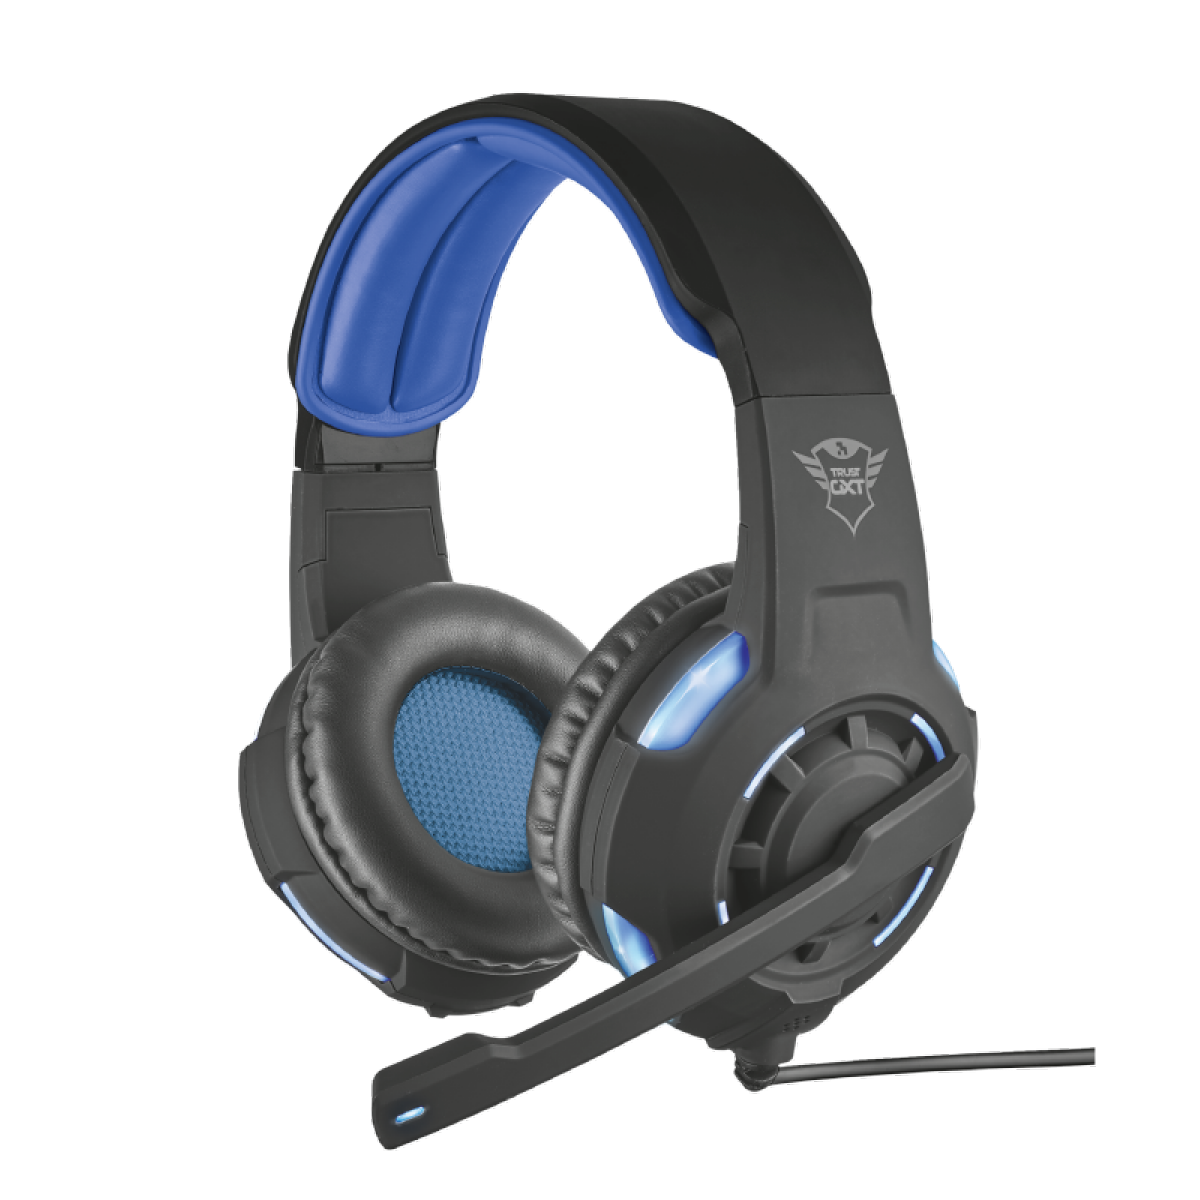 Headset GamerTrustRadius, 7.1 Surround, GXT350